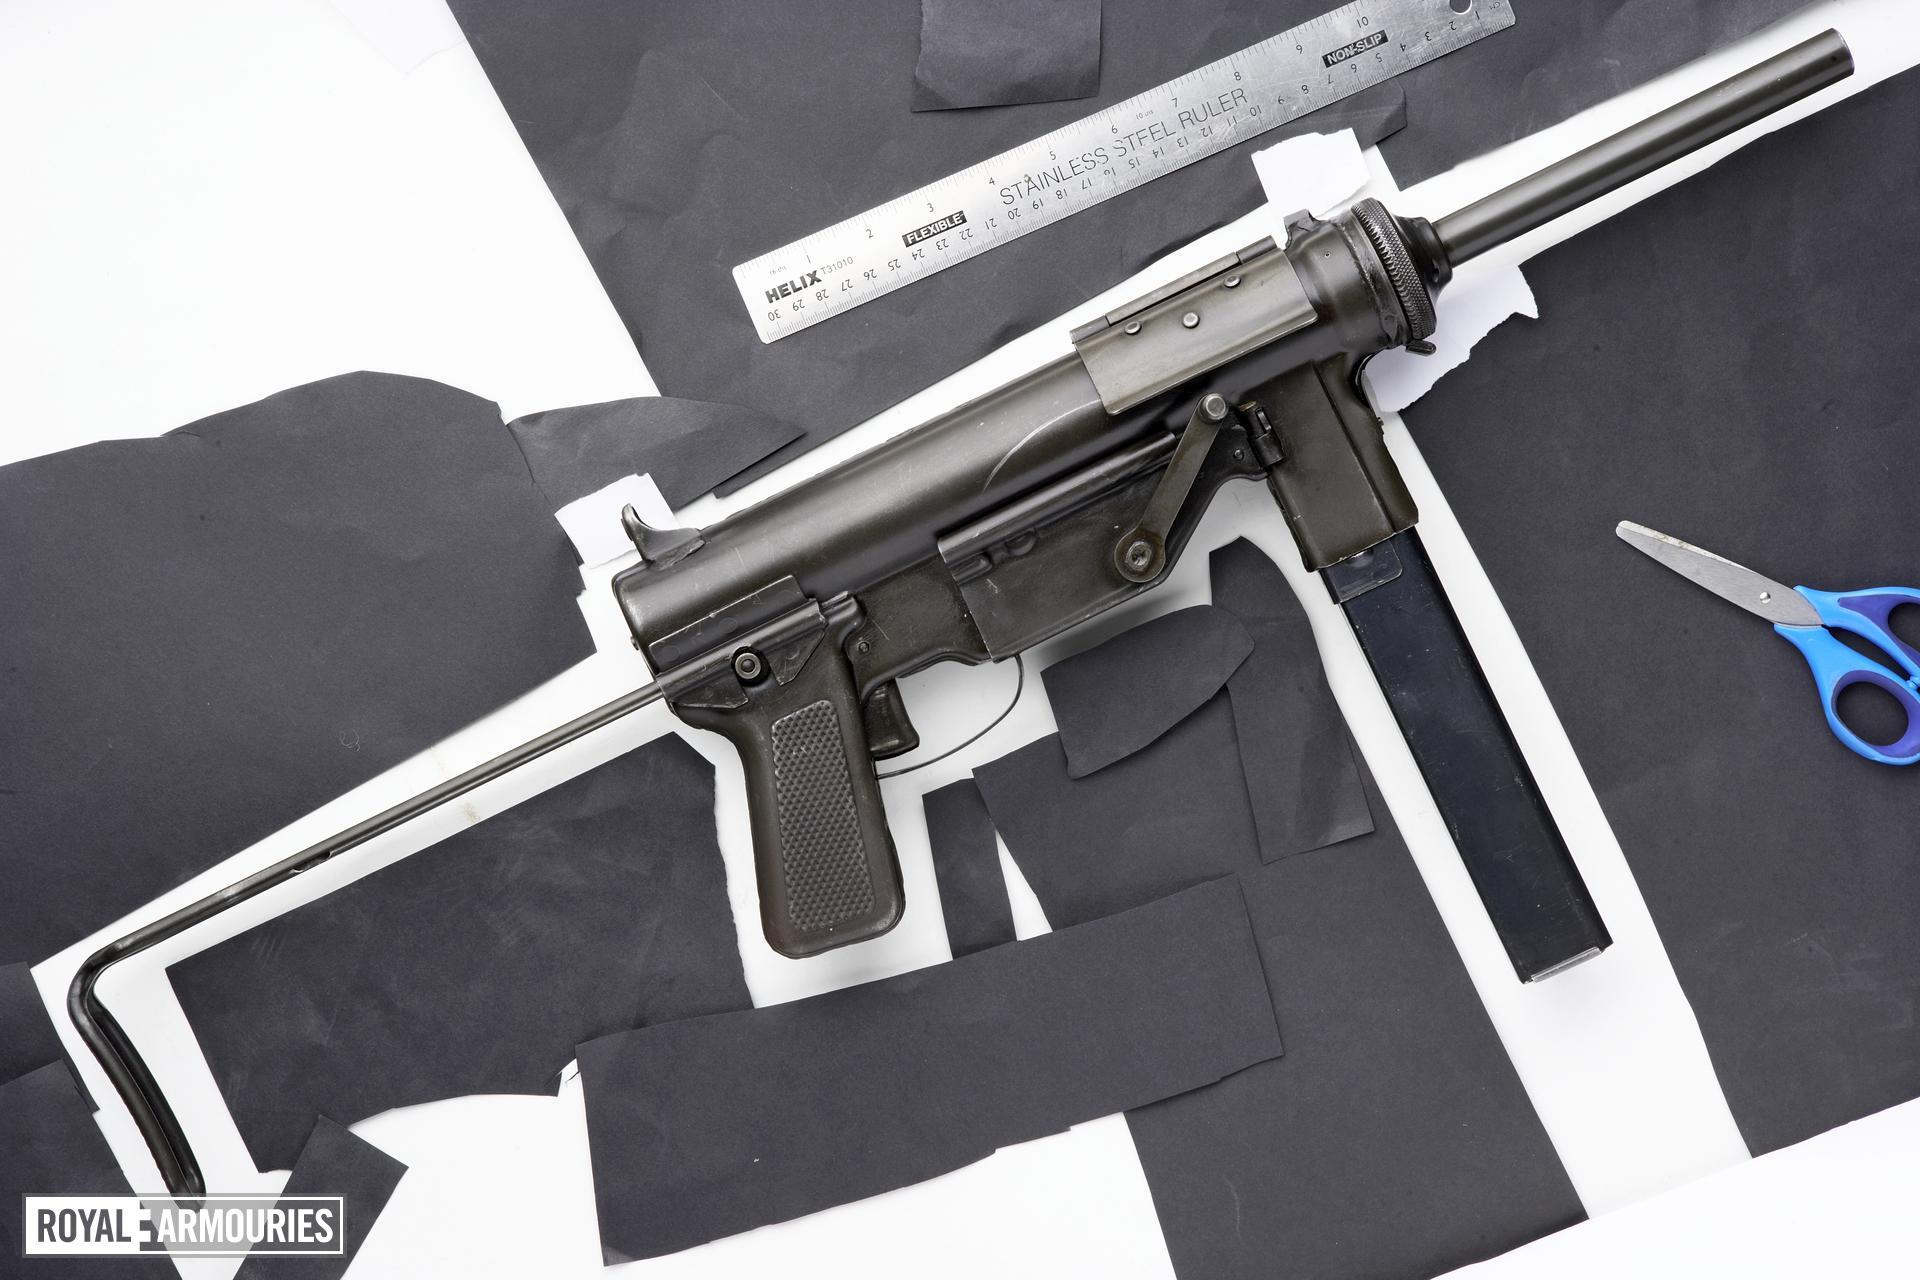 Centrefire automatic submachine gun - M3